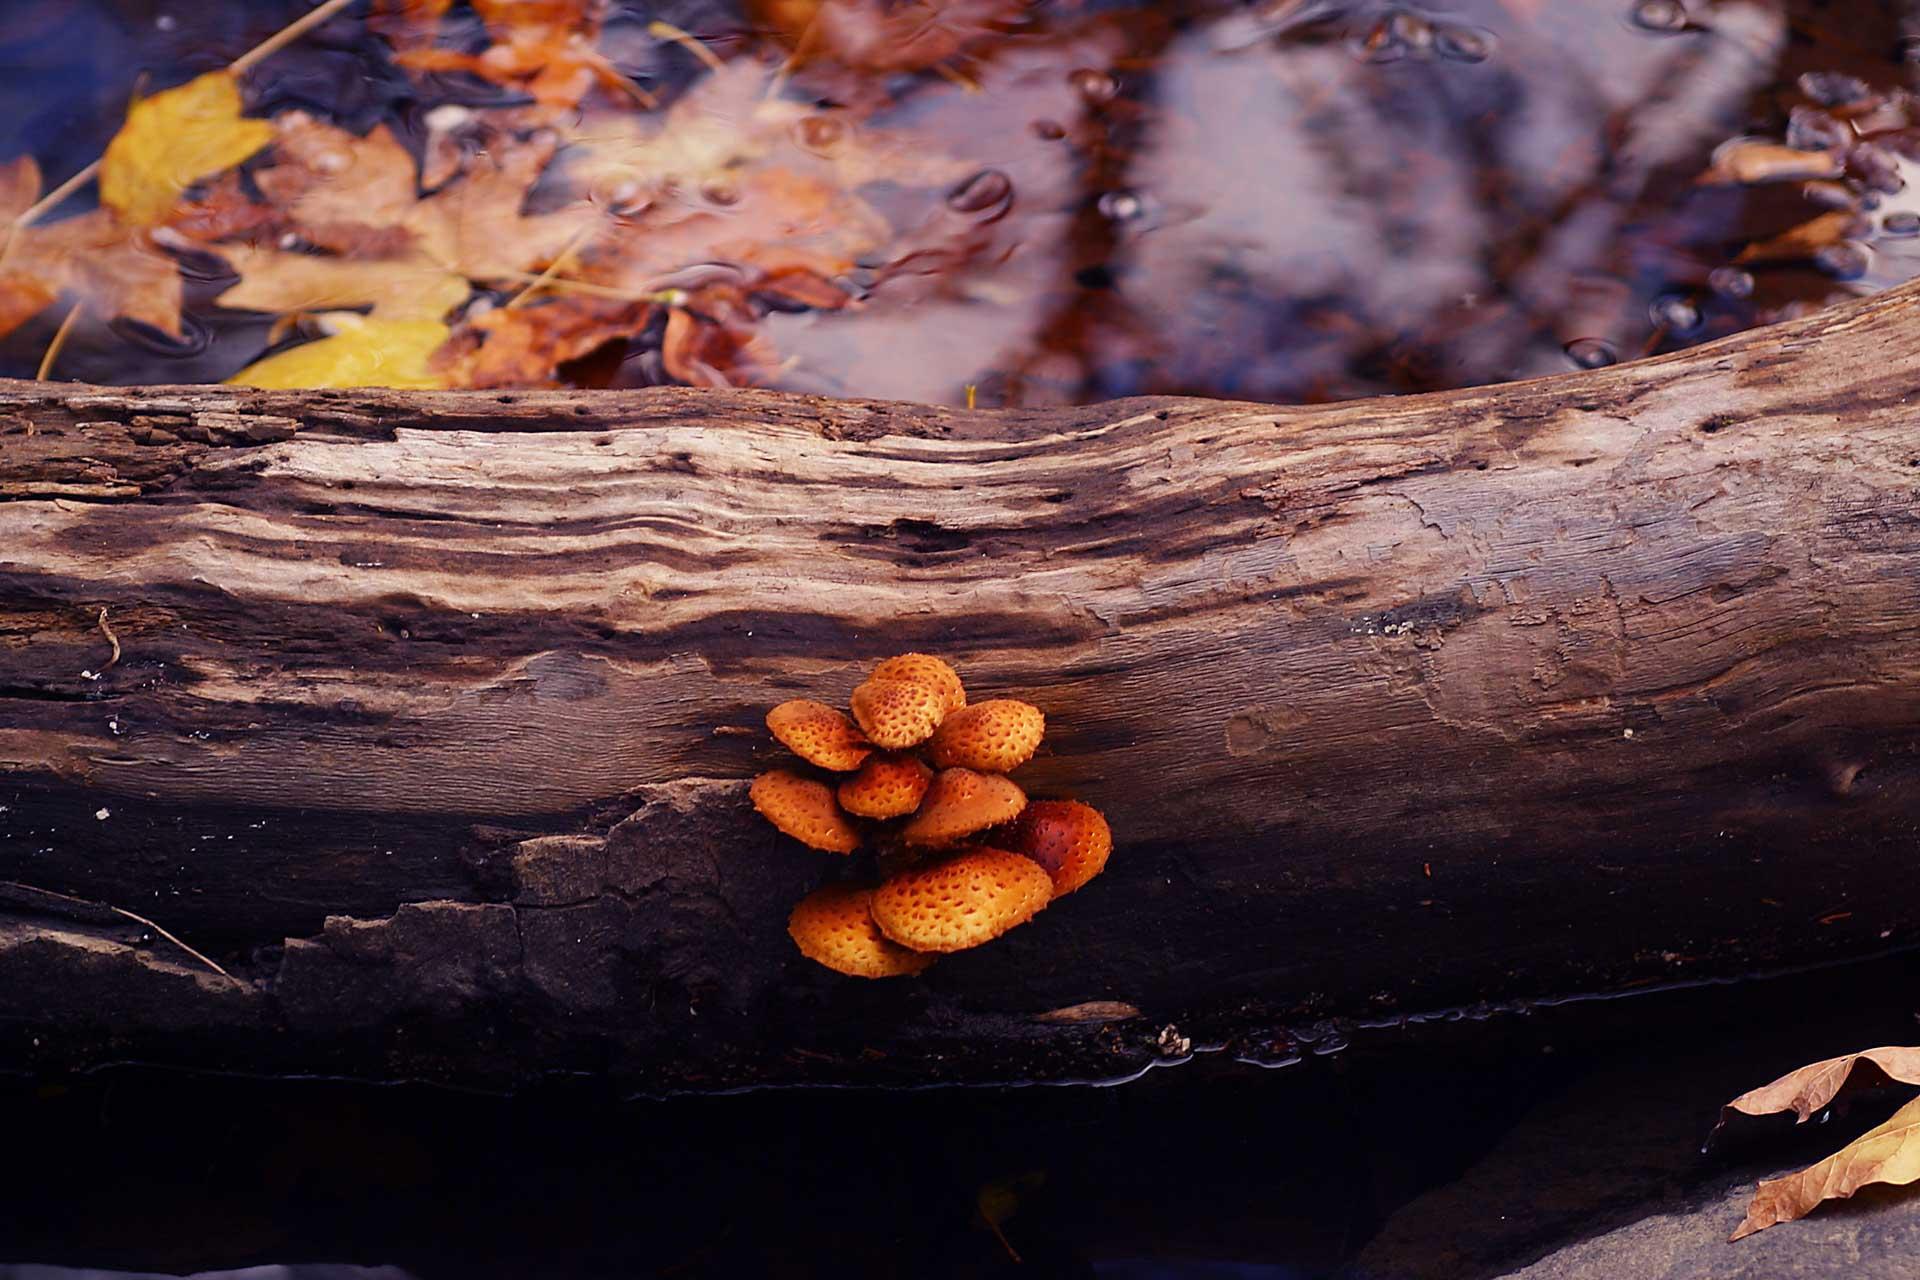 bruce berg fine art photography-5.jpg